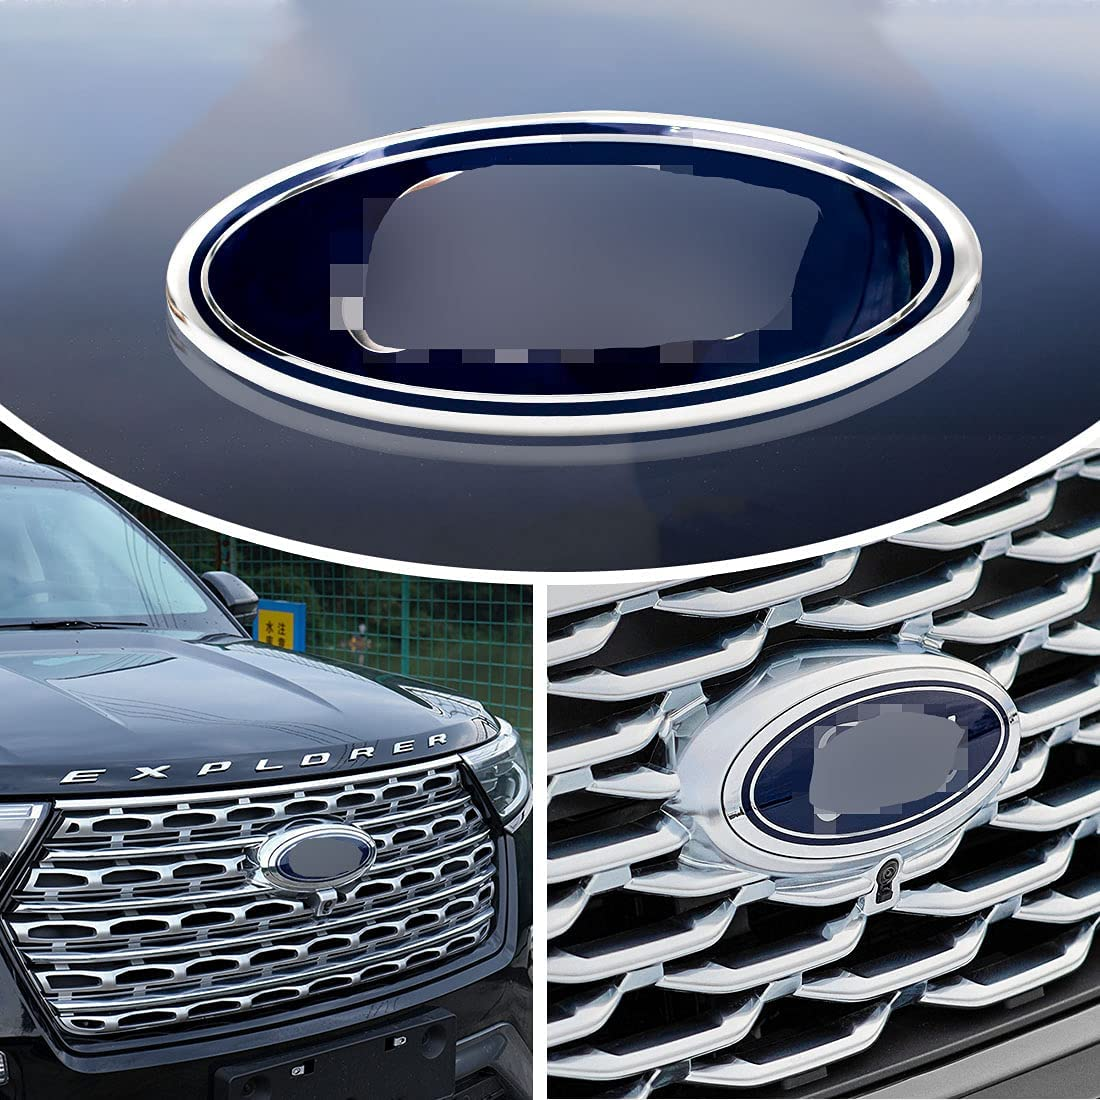 Automotive Emblems Explorer 2011 to 2016 F-250/F-350 2005 to 2007 ...